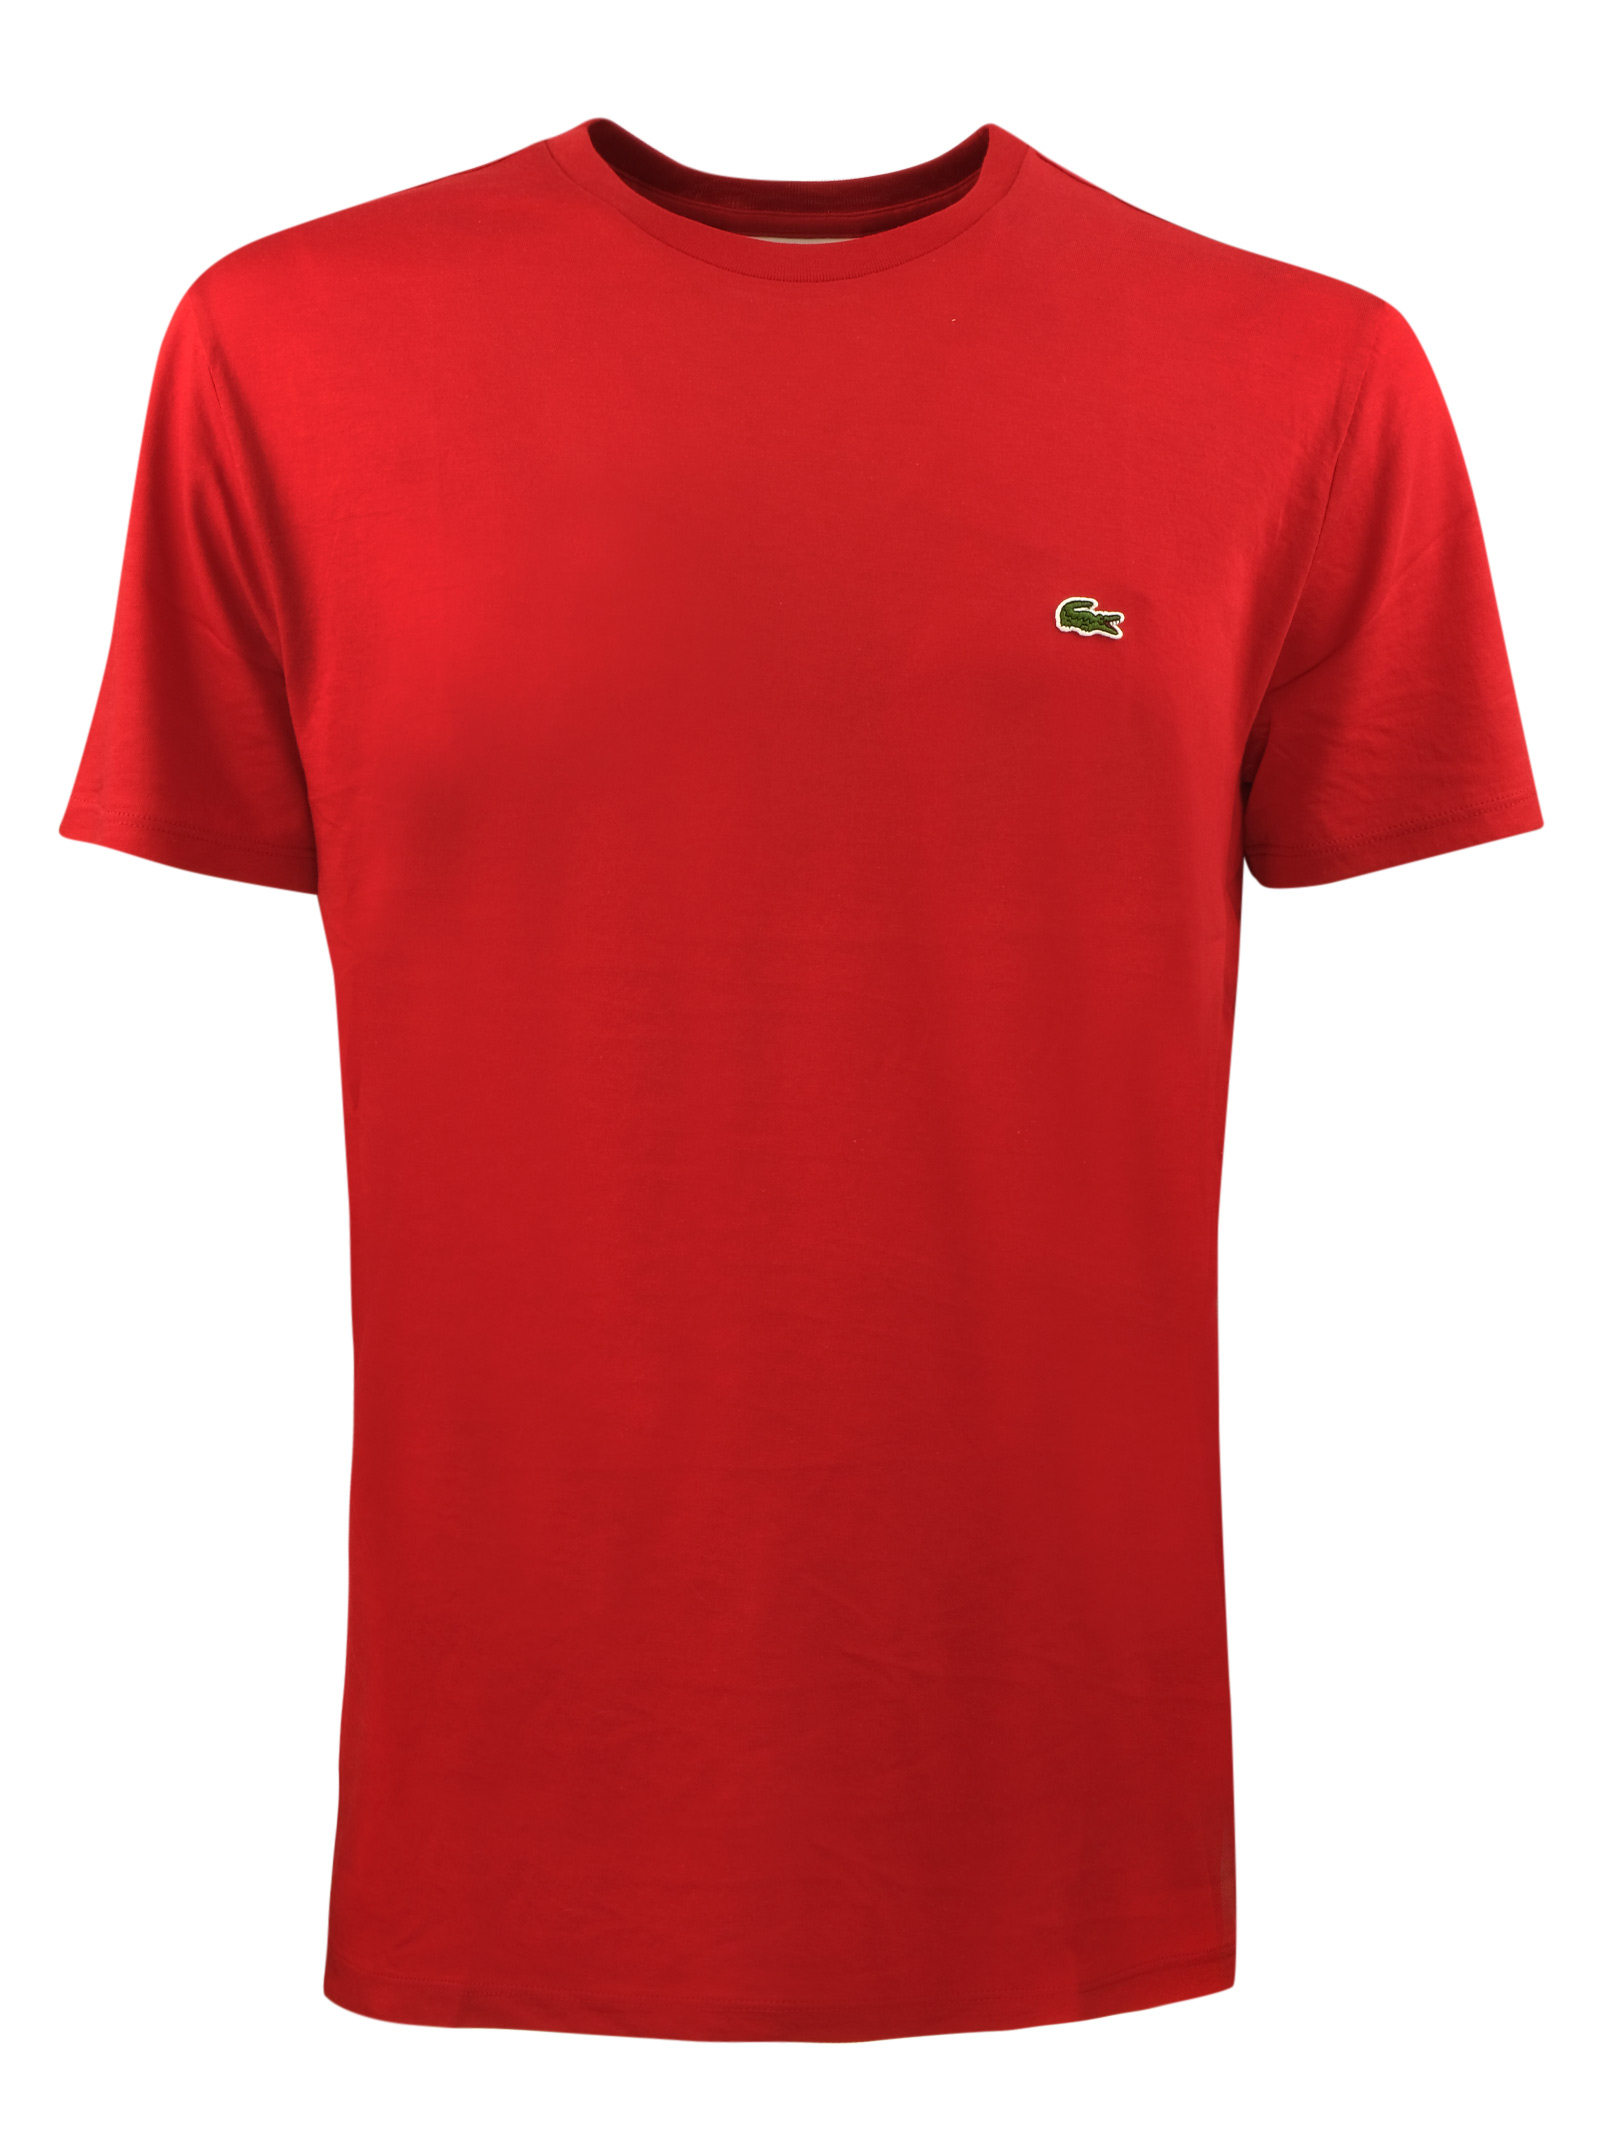 Pima cotton t-shirt LACOSTE | T-shirts | TH6709240